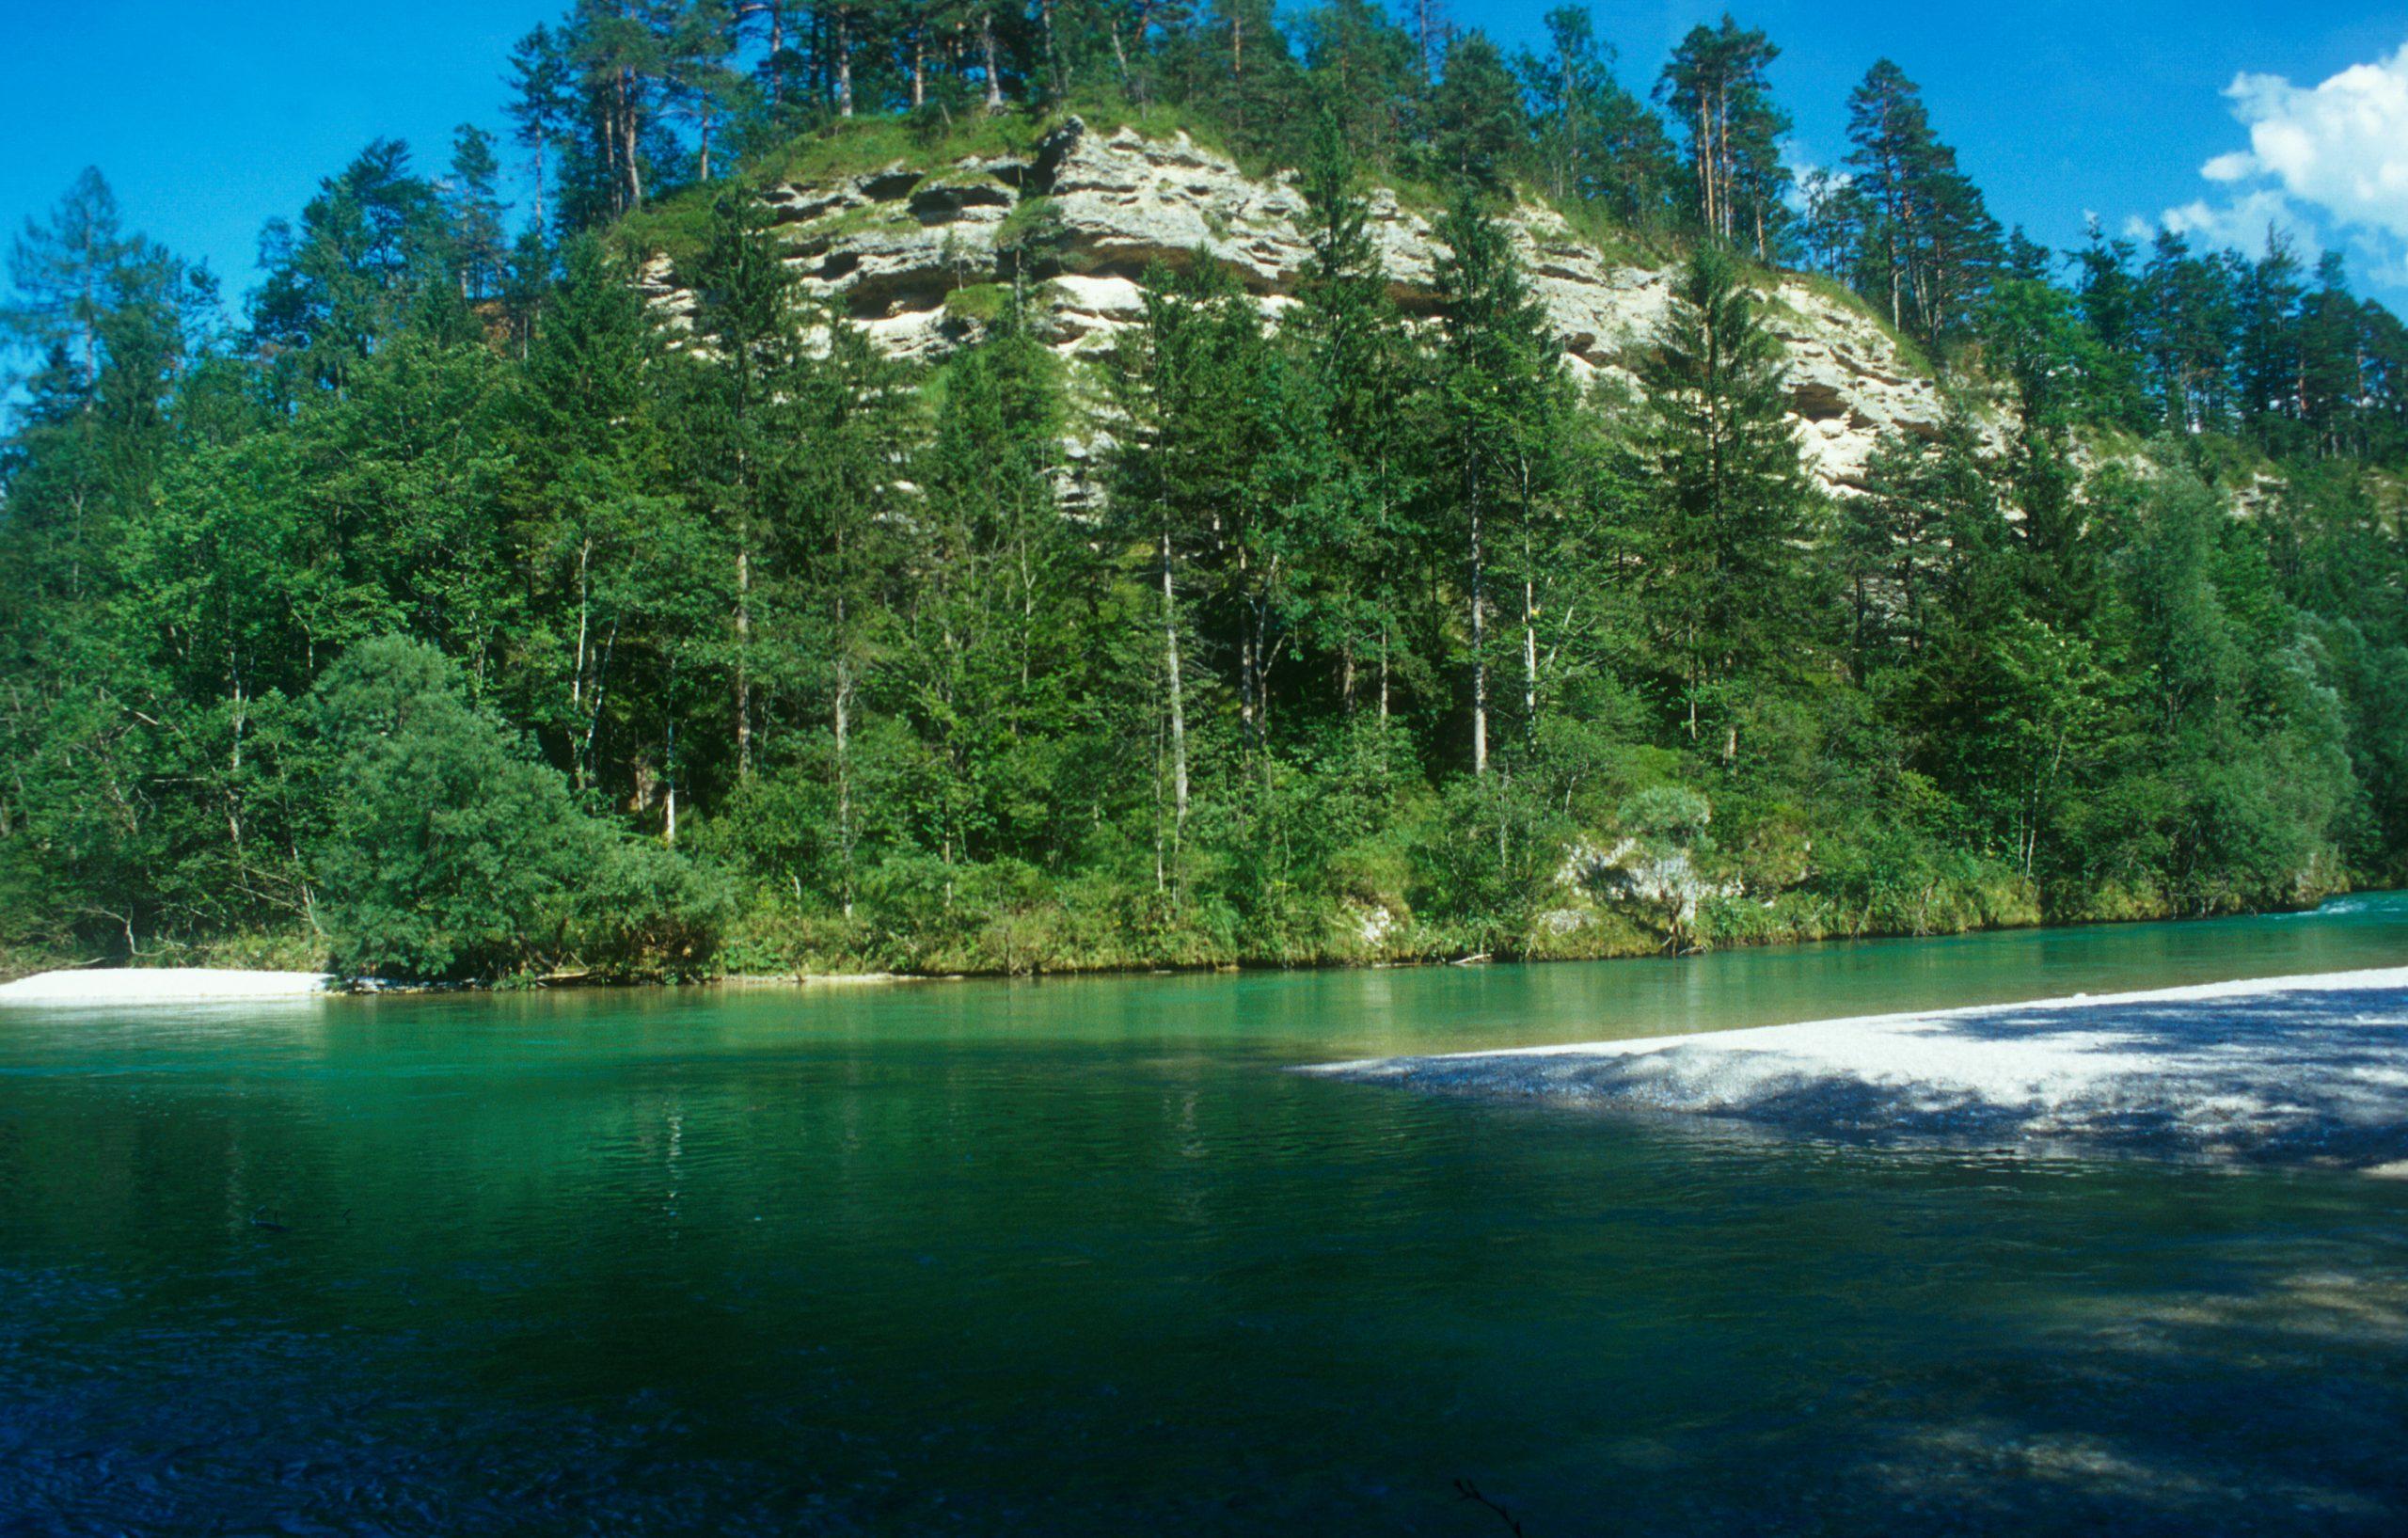 Steyr_Flusslandschaft_Essl